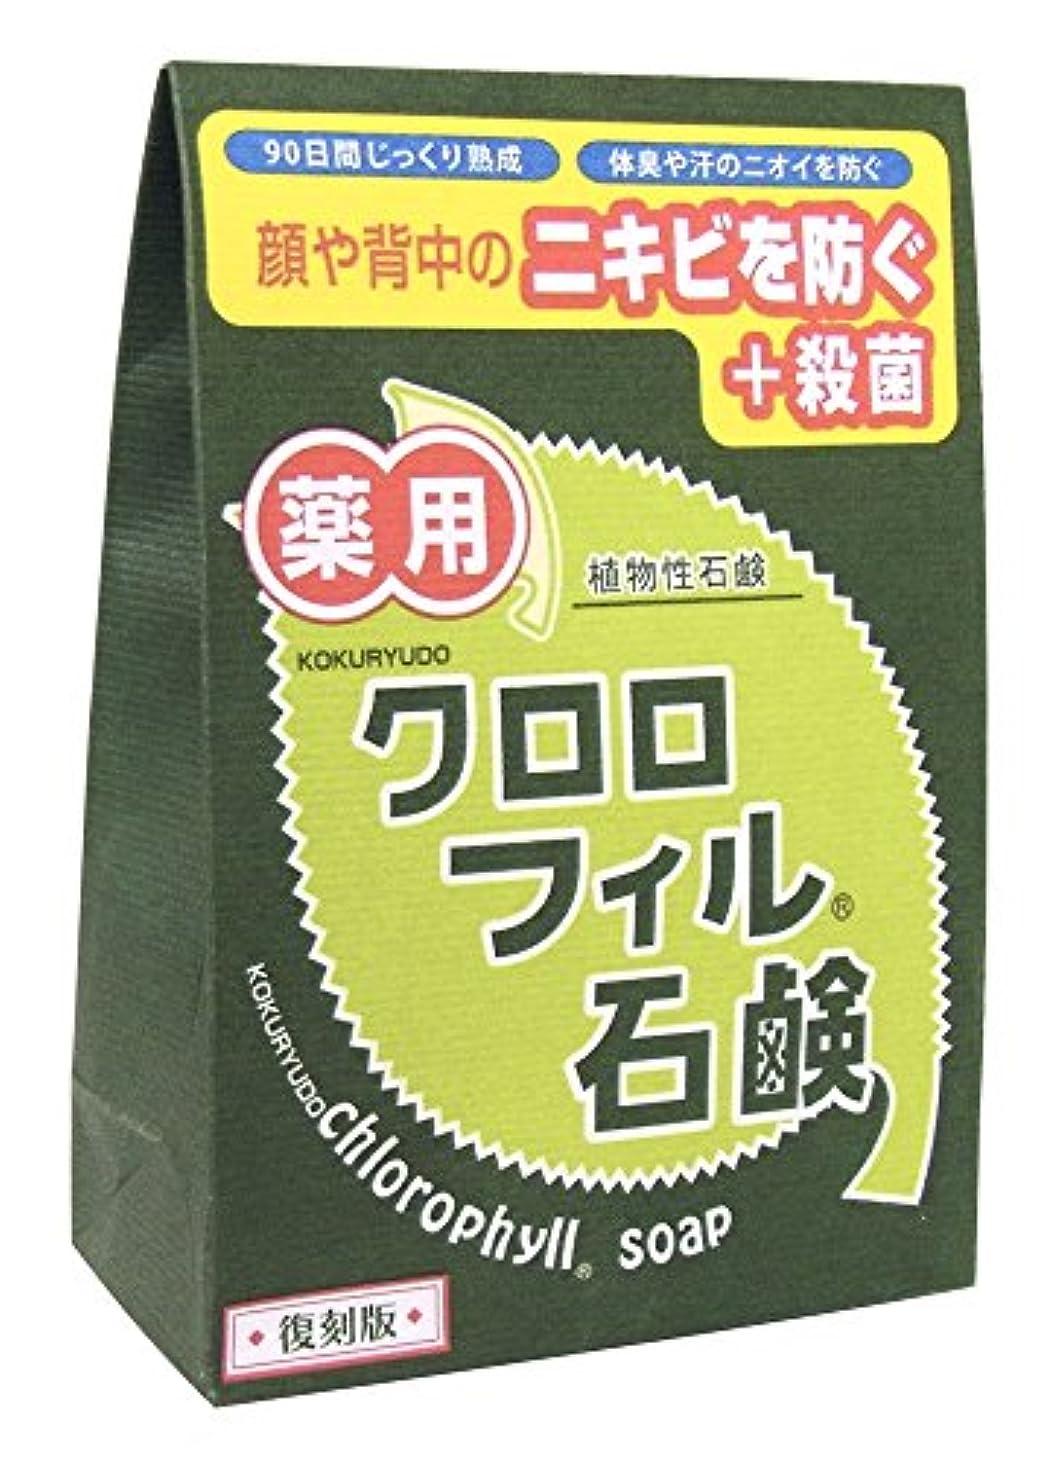 意識的彼女良心クロロフィル石鹸 復刻版 85g (医薬部外品)